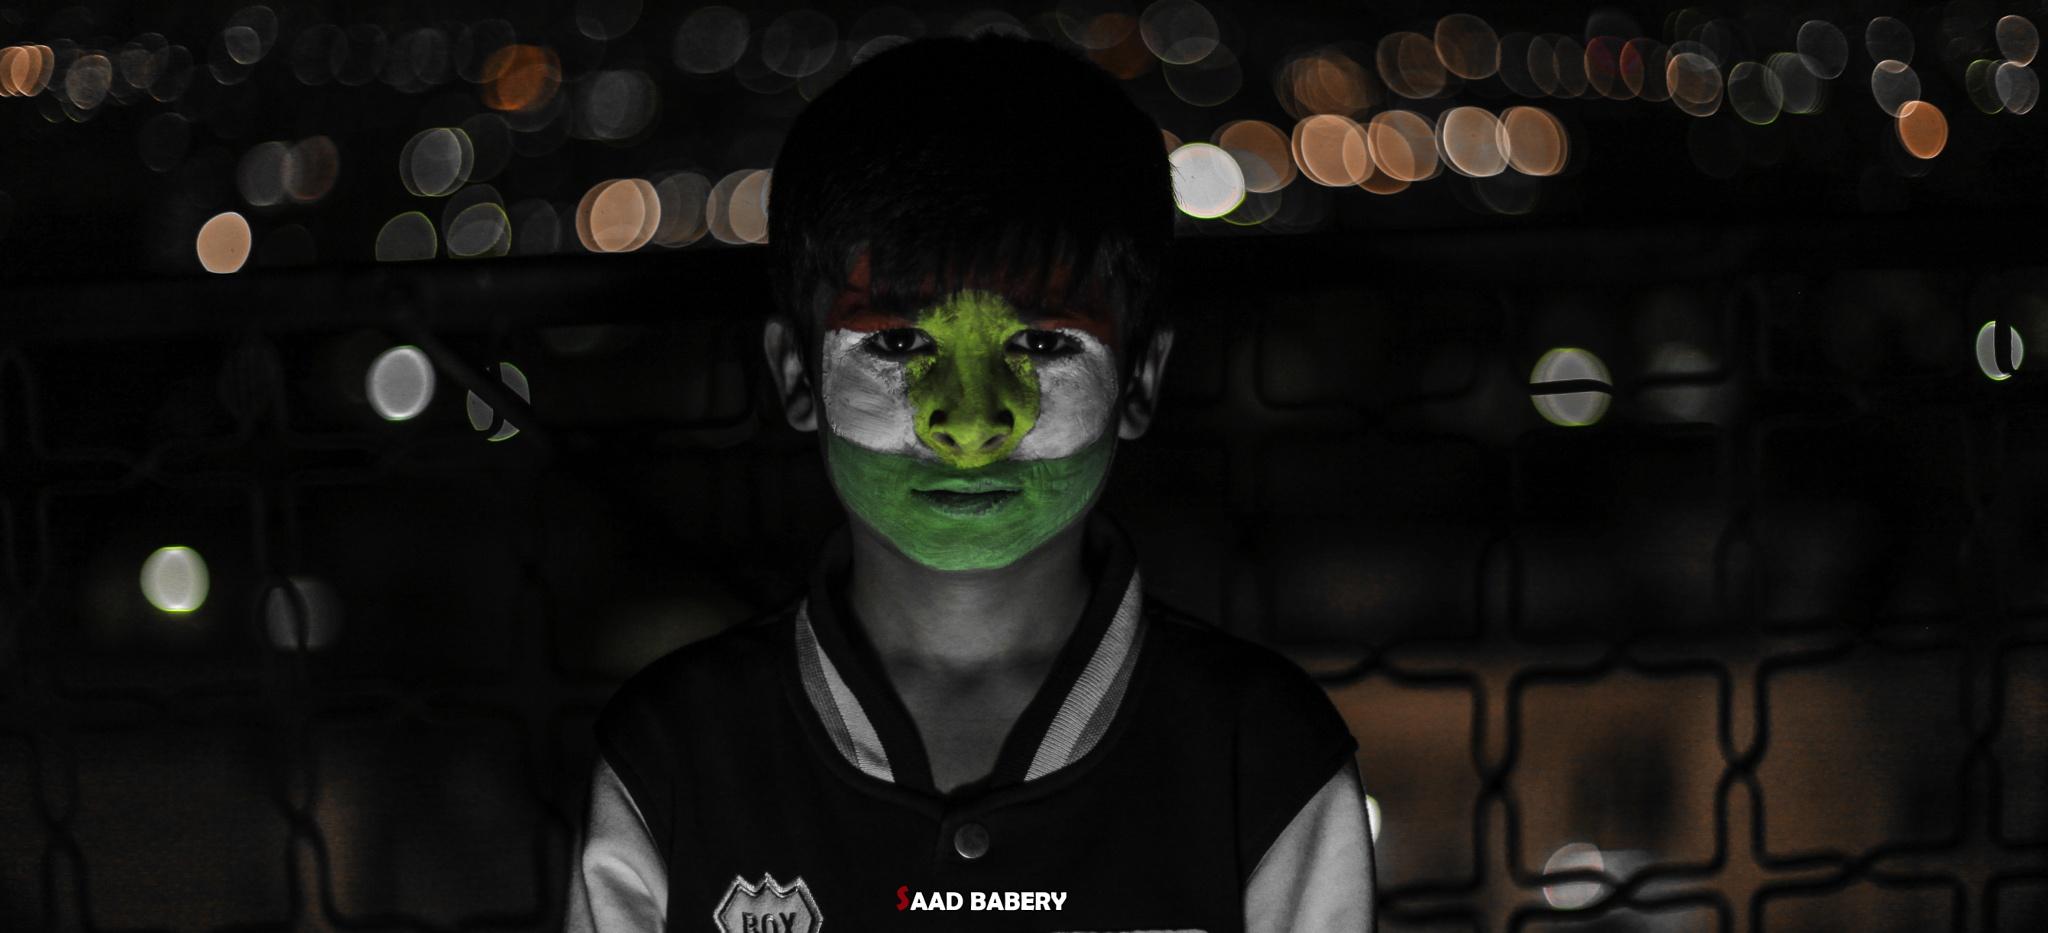 kurdish boy by Saad Babery